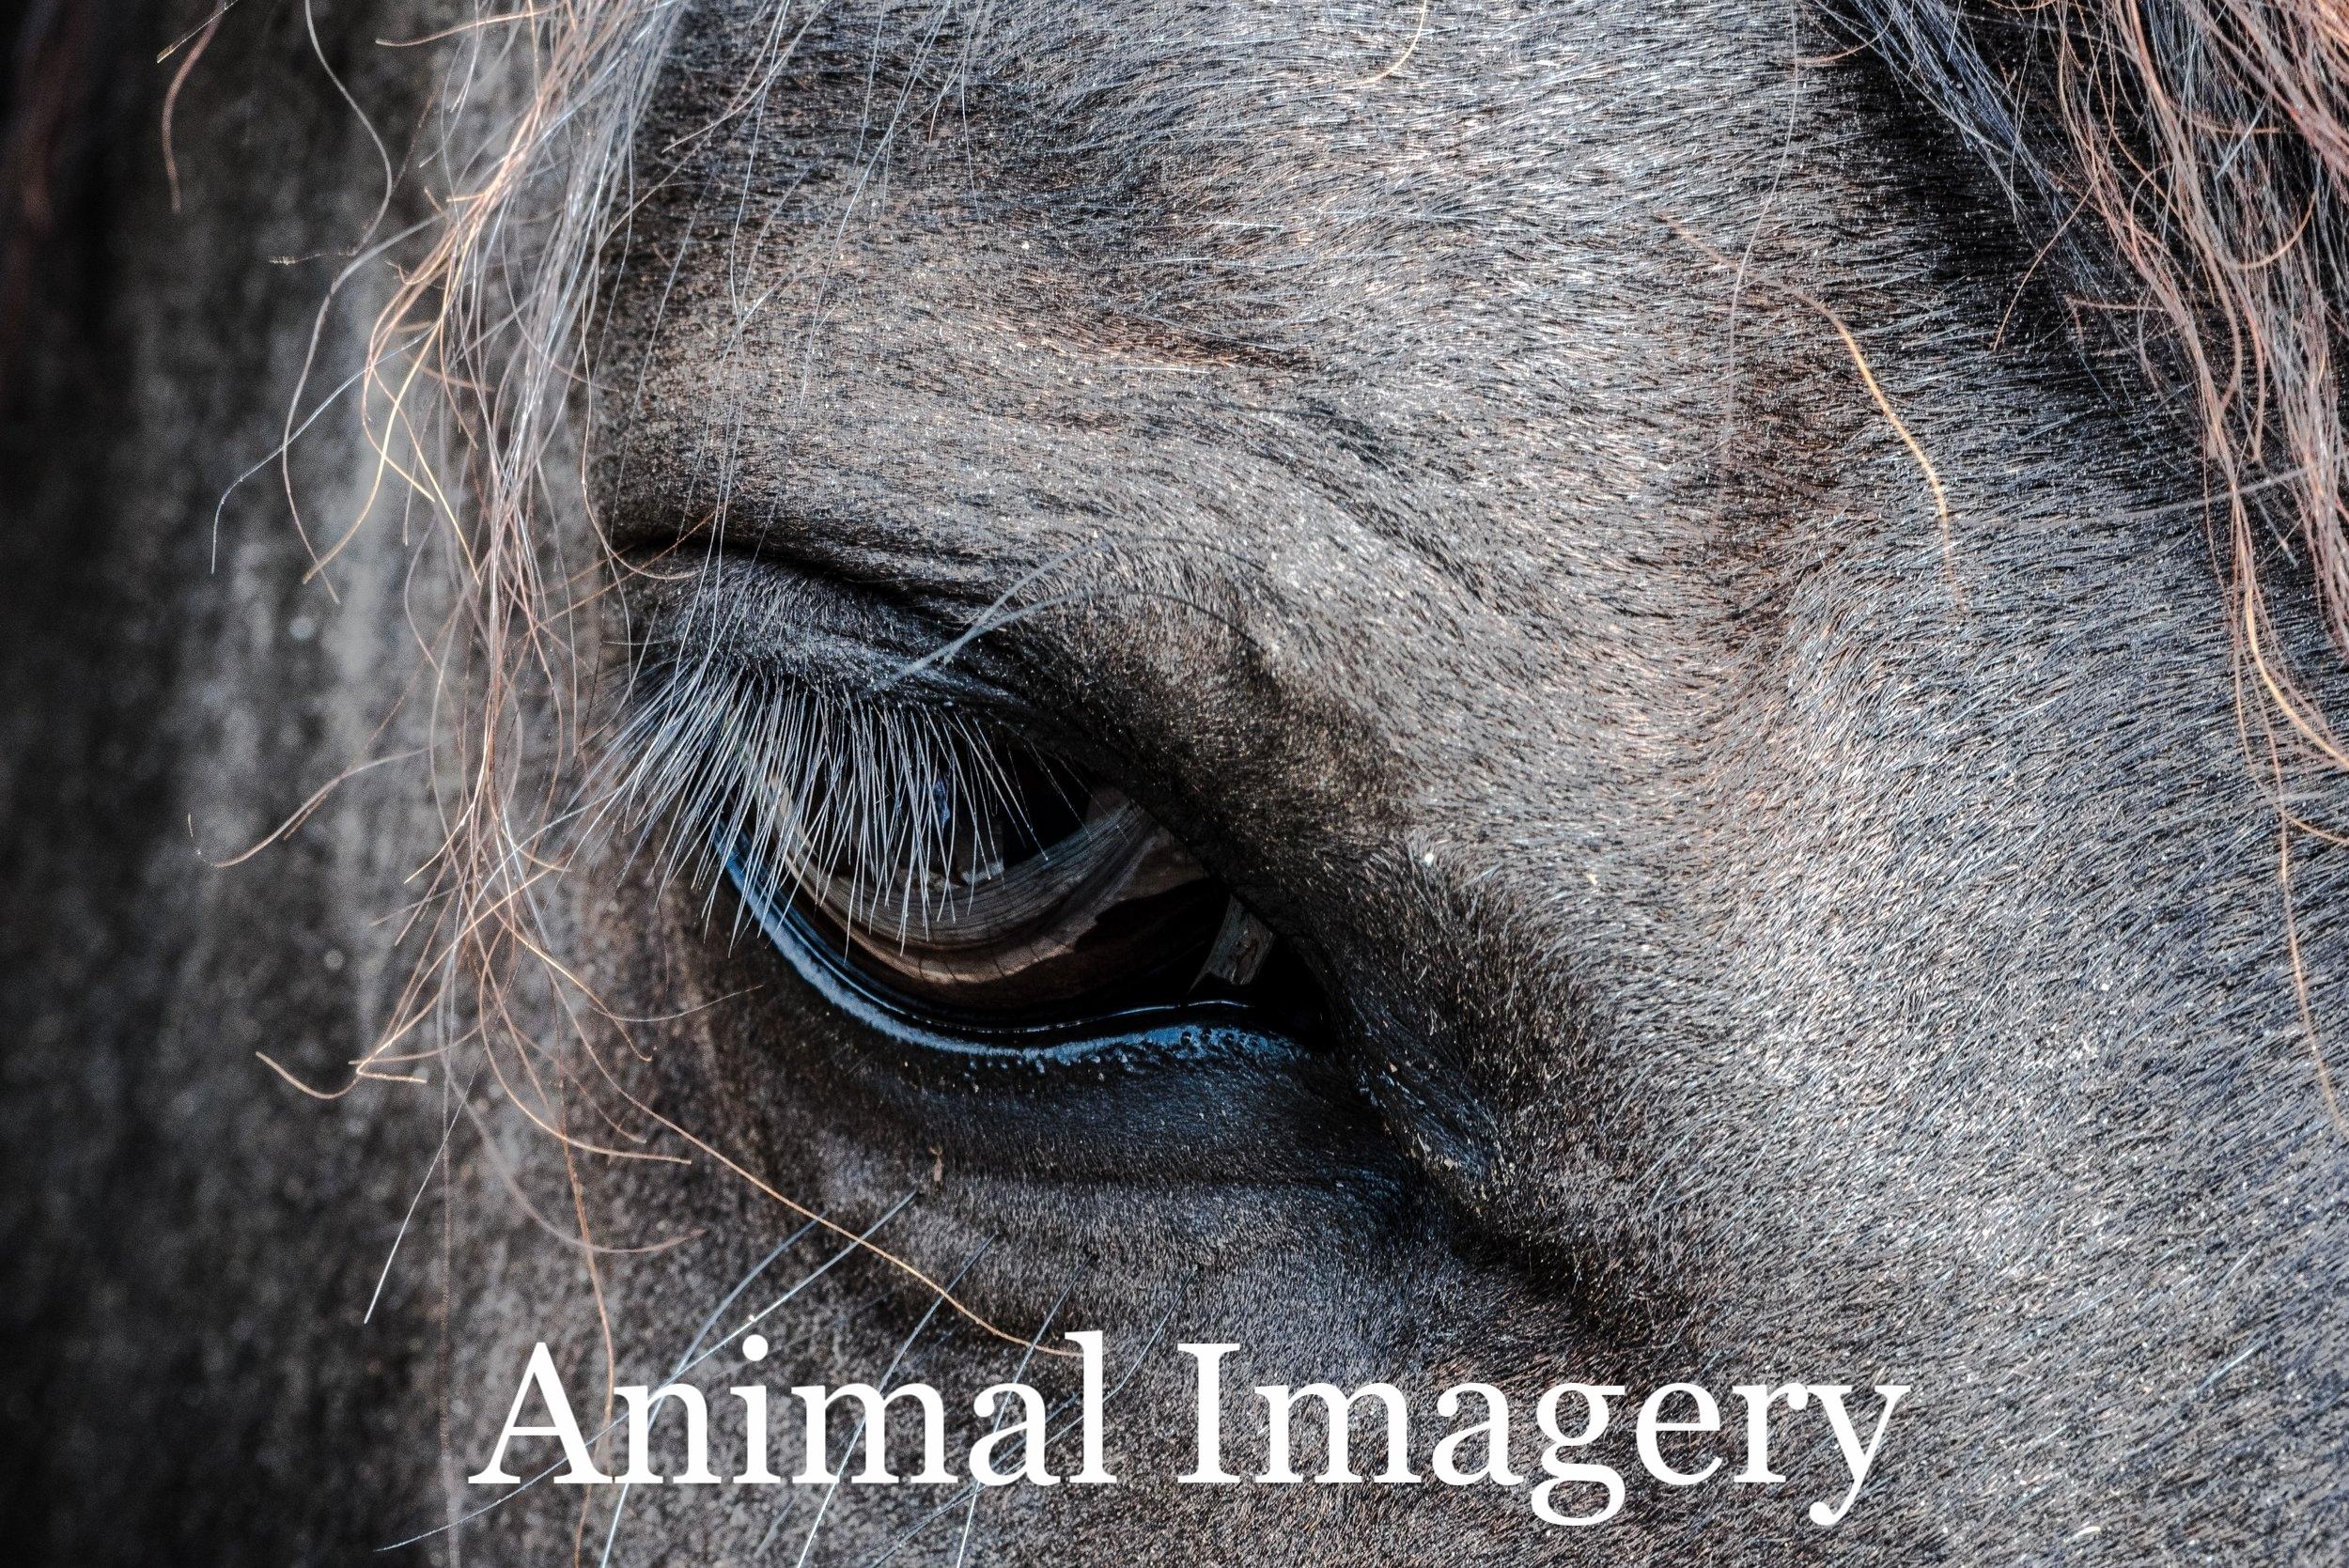 jez timms horse face detail  Up cW.jpeg